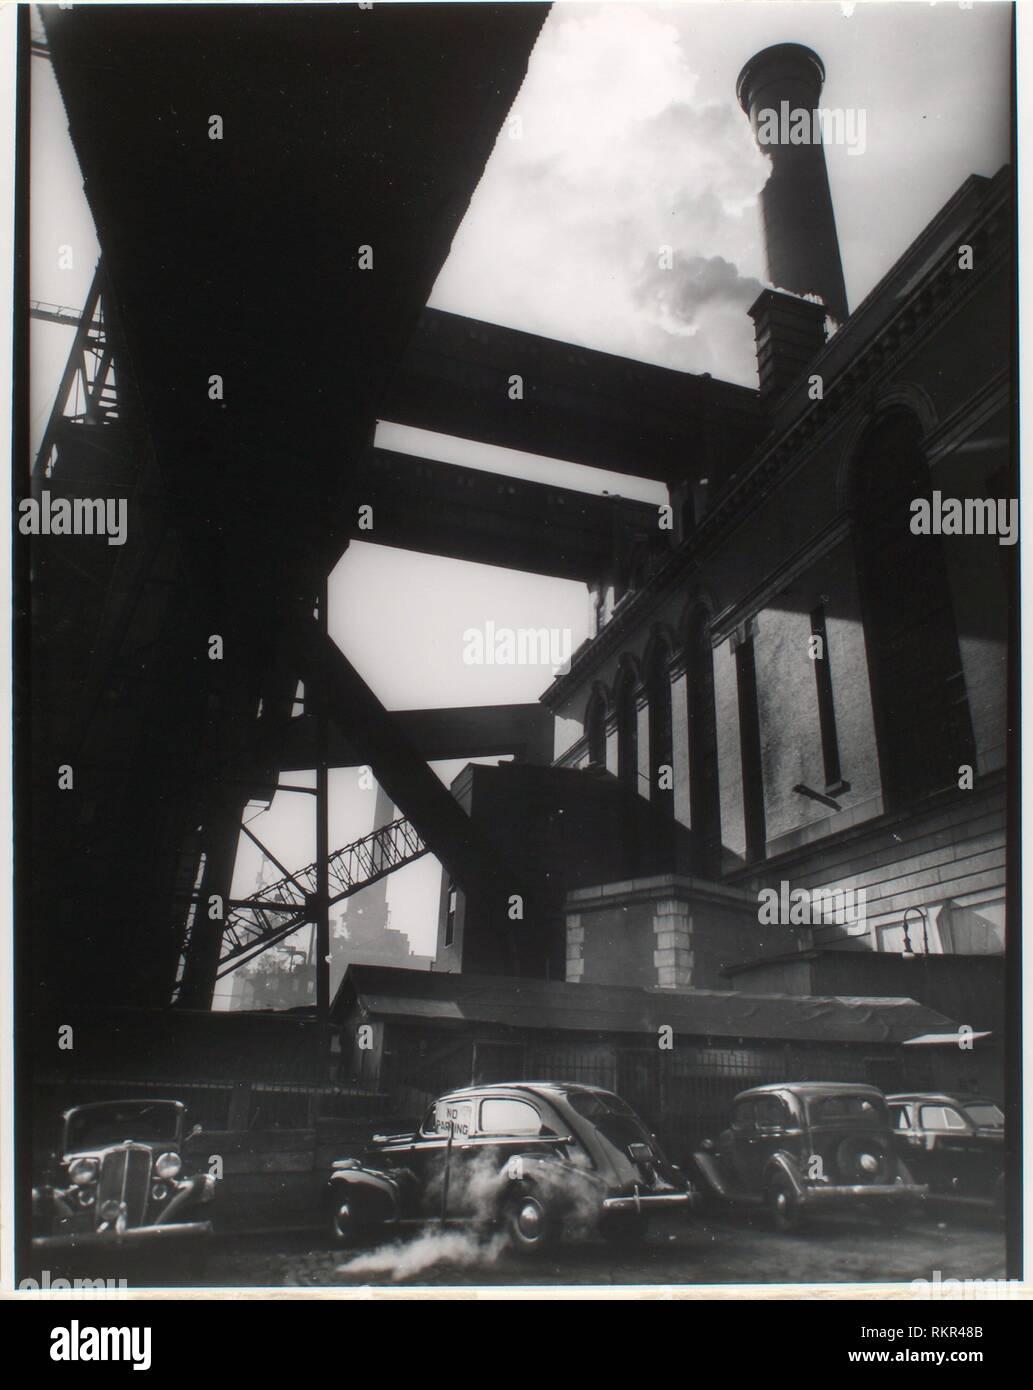 Consolidated Edison powerhouse, 666 1st Avenue, Manhattan. Abbott, Berenice, 1898-1991 (Photographer) Federal Art Project (New York, N.Y.) (Sponsor). - Stock Image